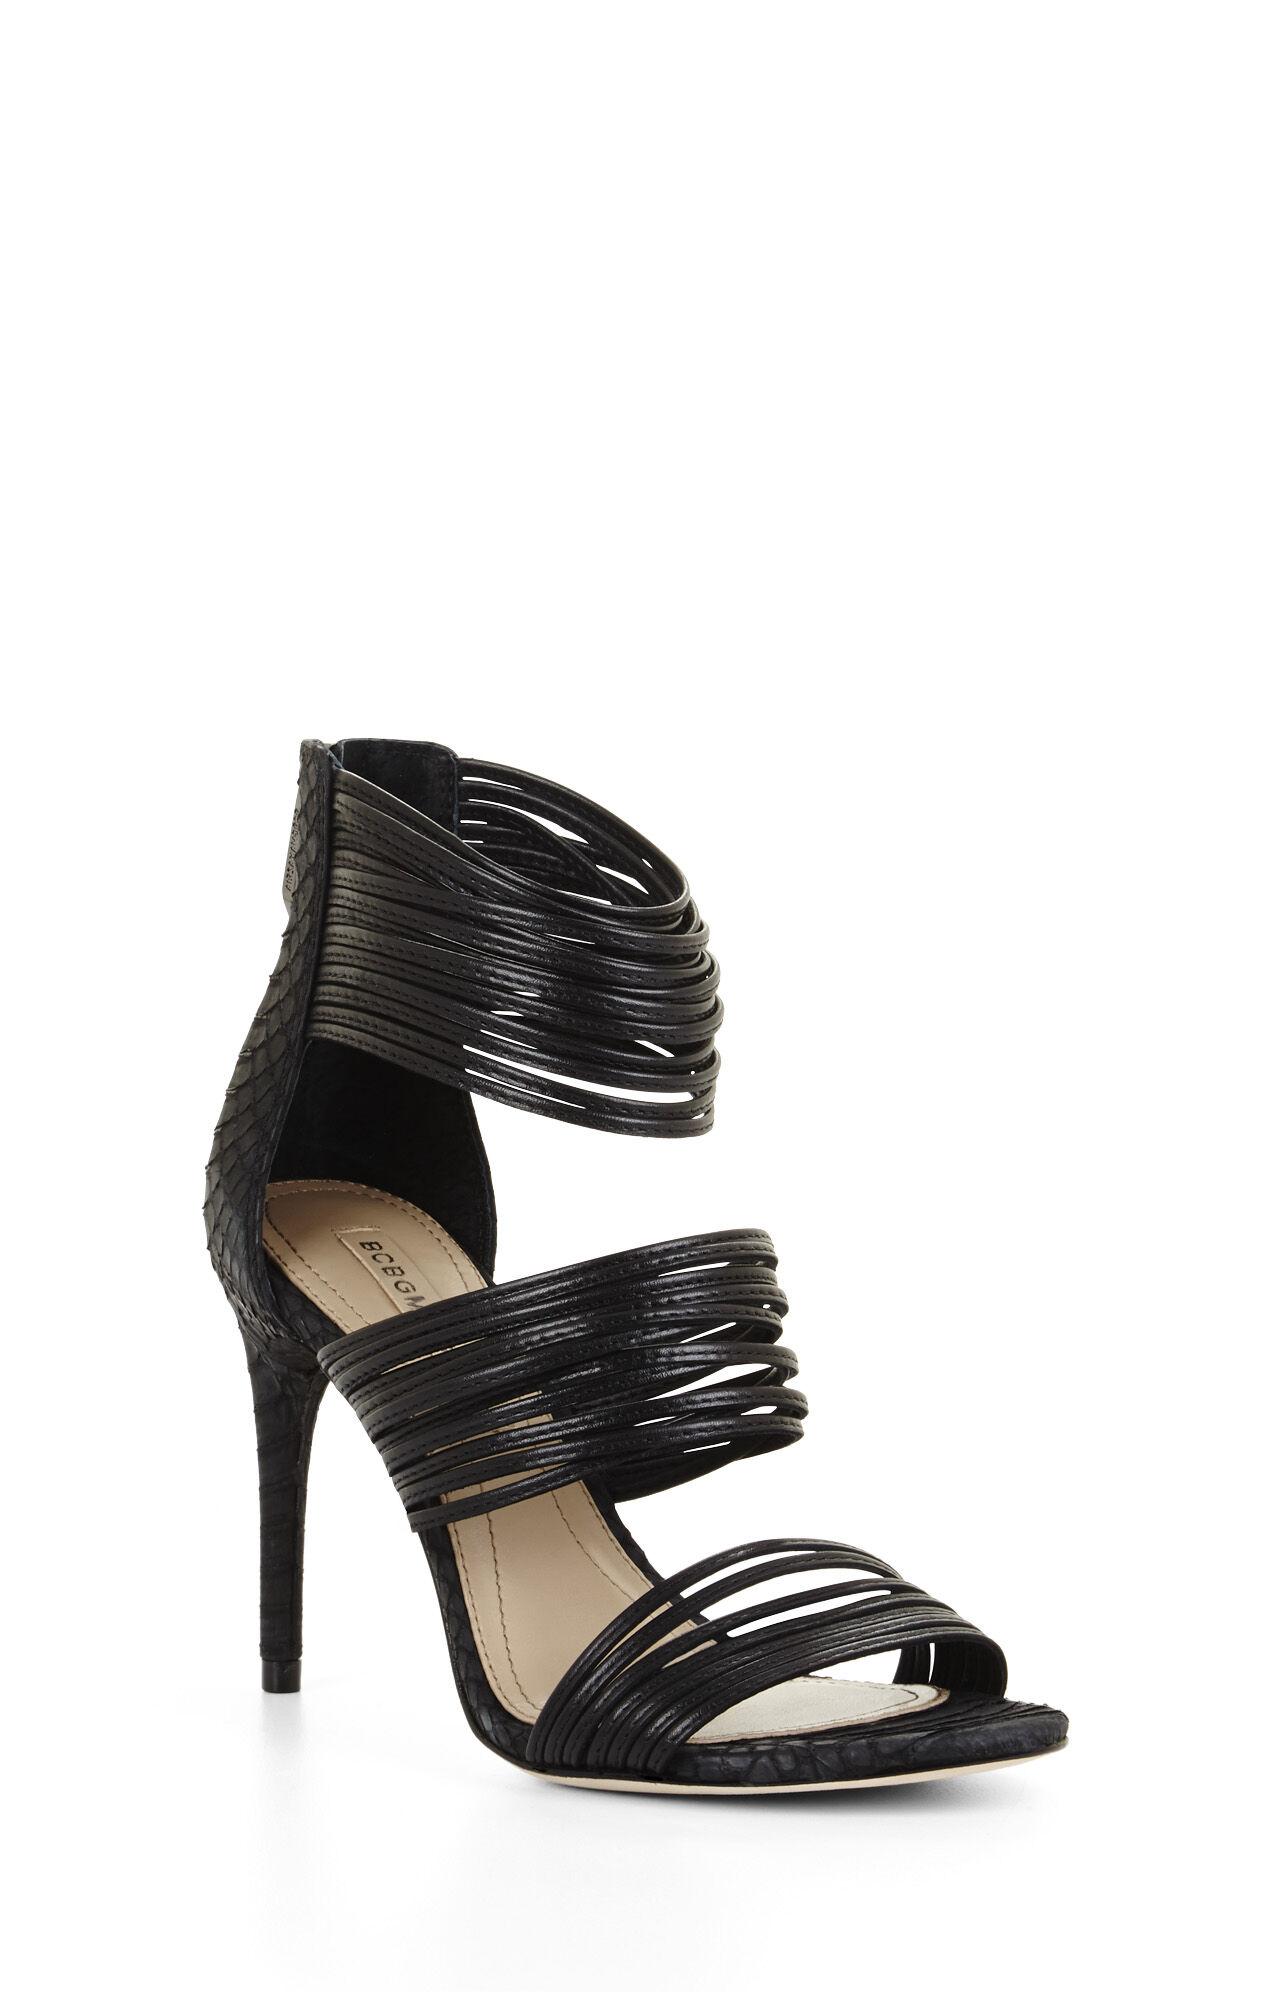 Pex High-Heel Strappy Day Sandal